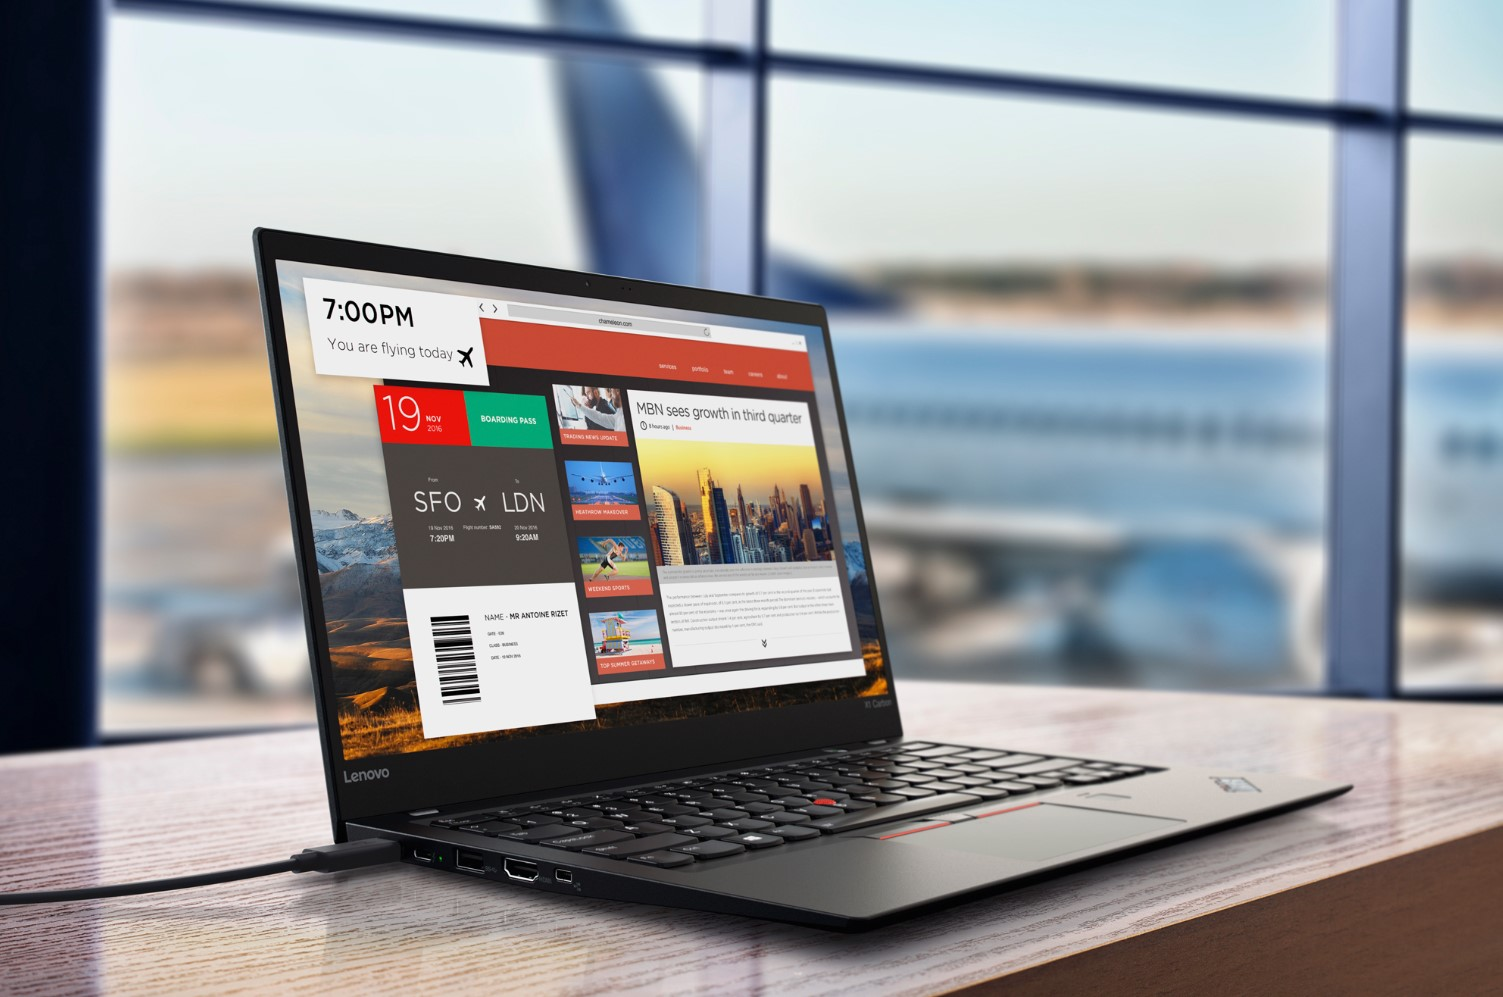 Lenovo ThinkPad X1 Carbon 7 – topowy bardzo cienki laptop – Instytut IT